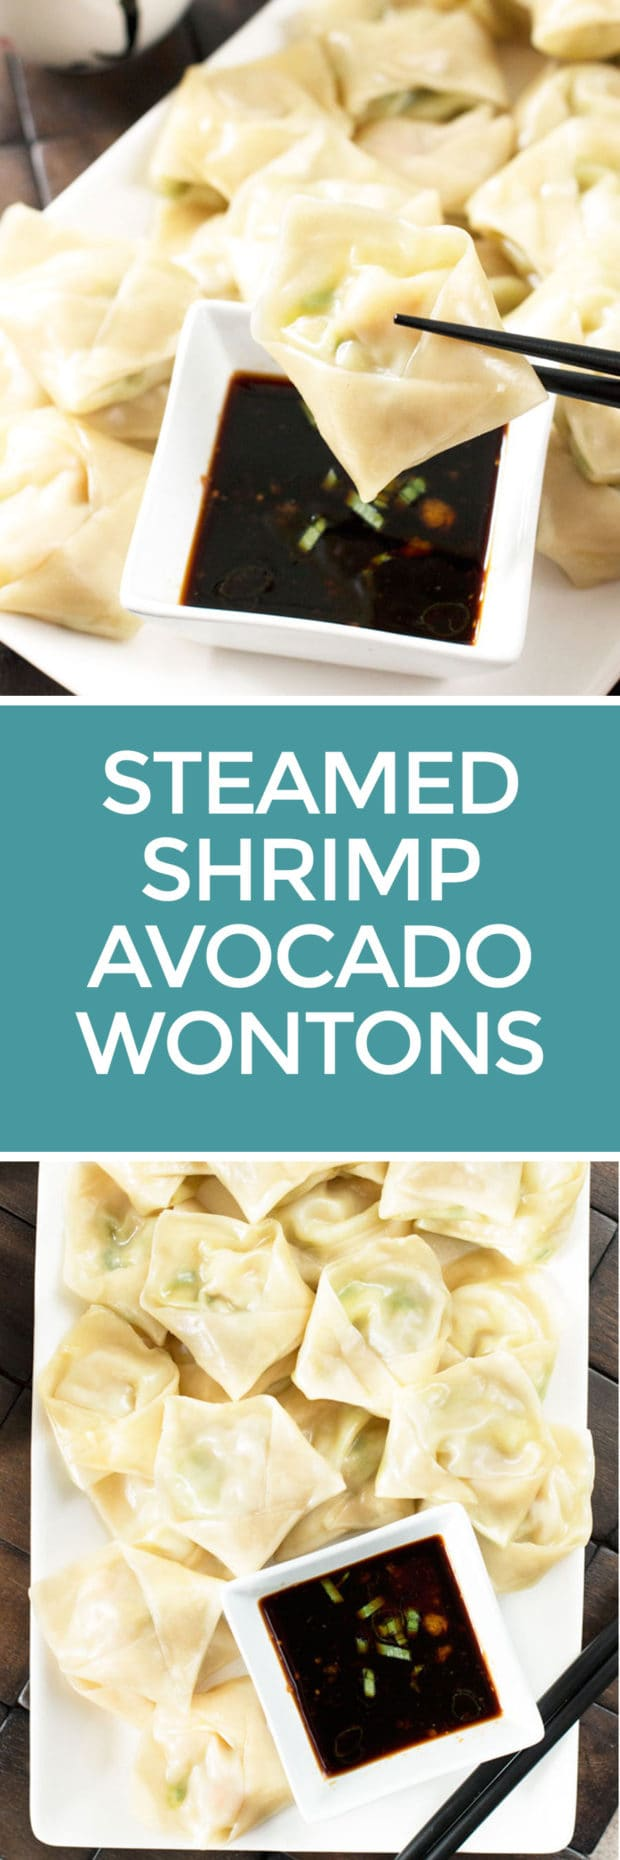 Steamed Shrimp Avocado Wontons with Ginger Dipping Sauce | cakenknife.com